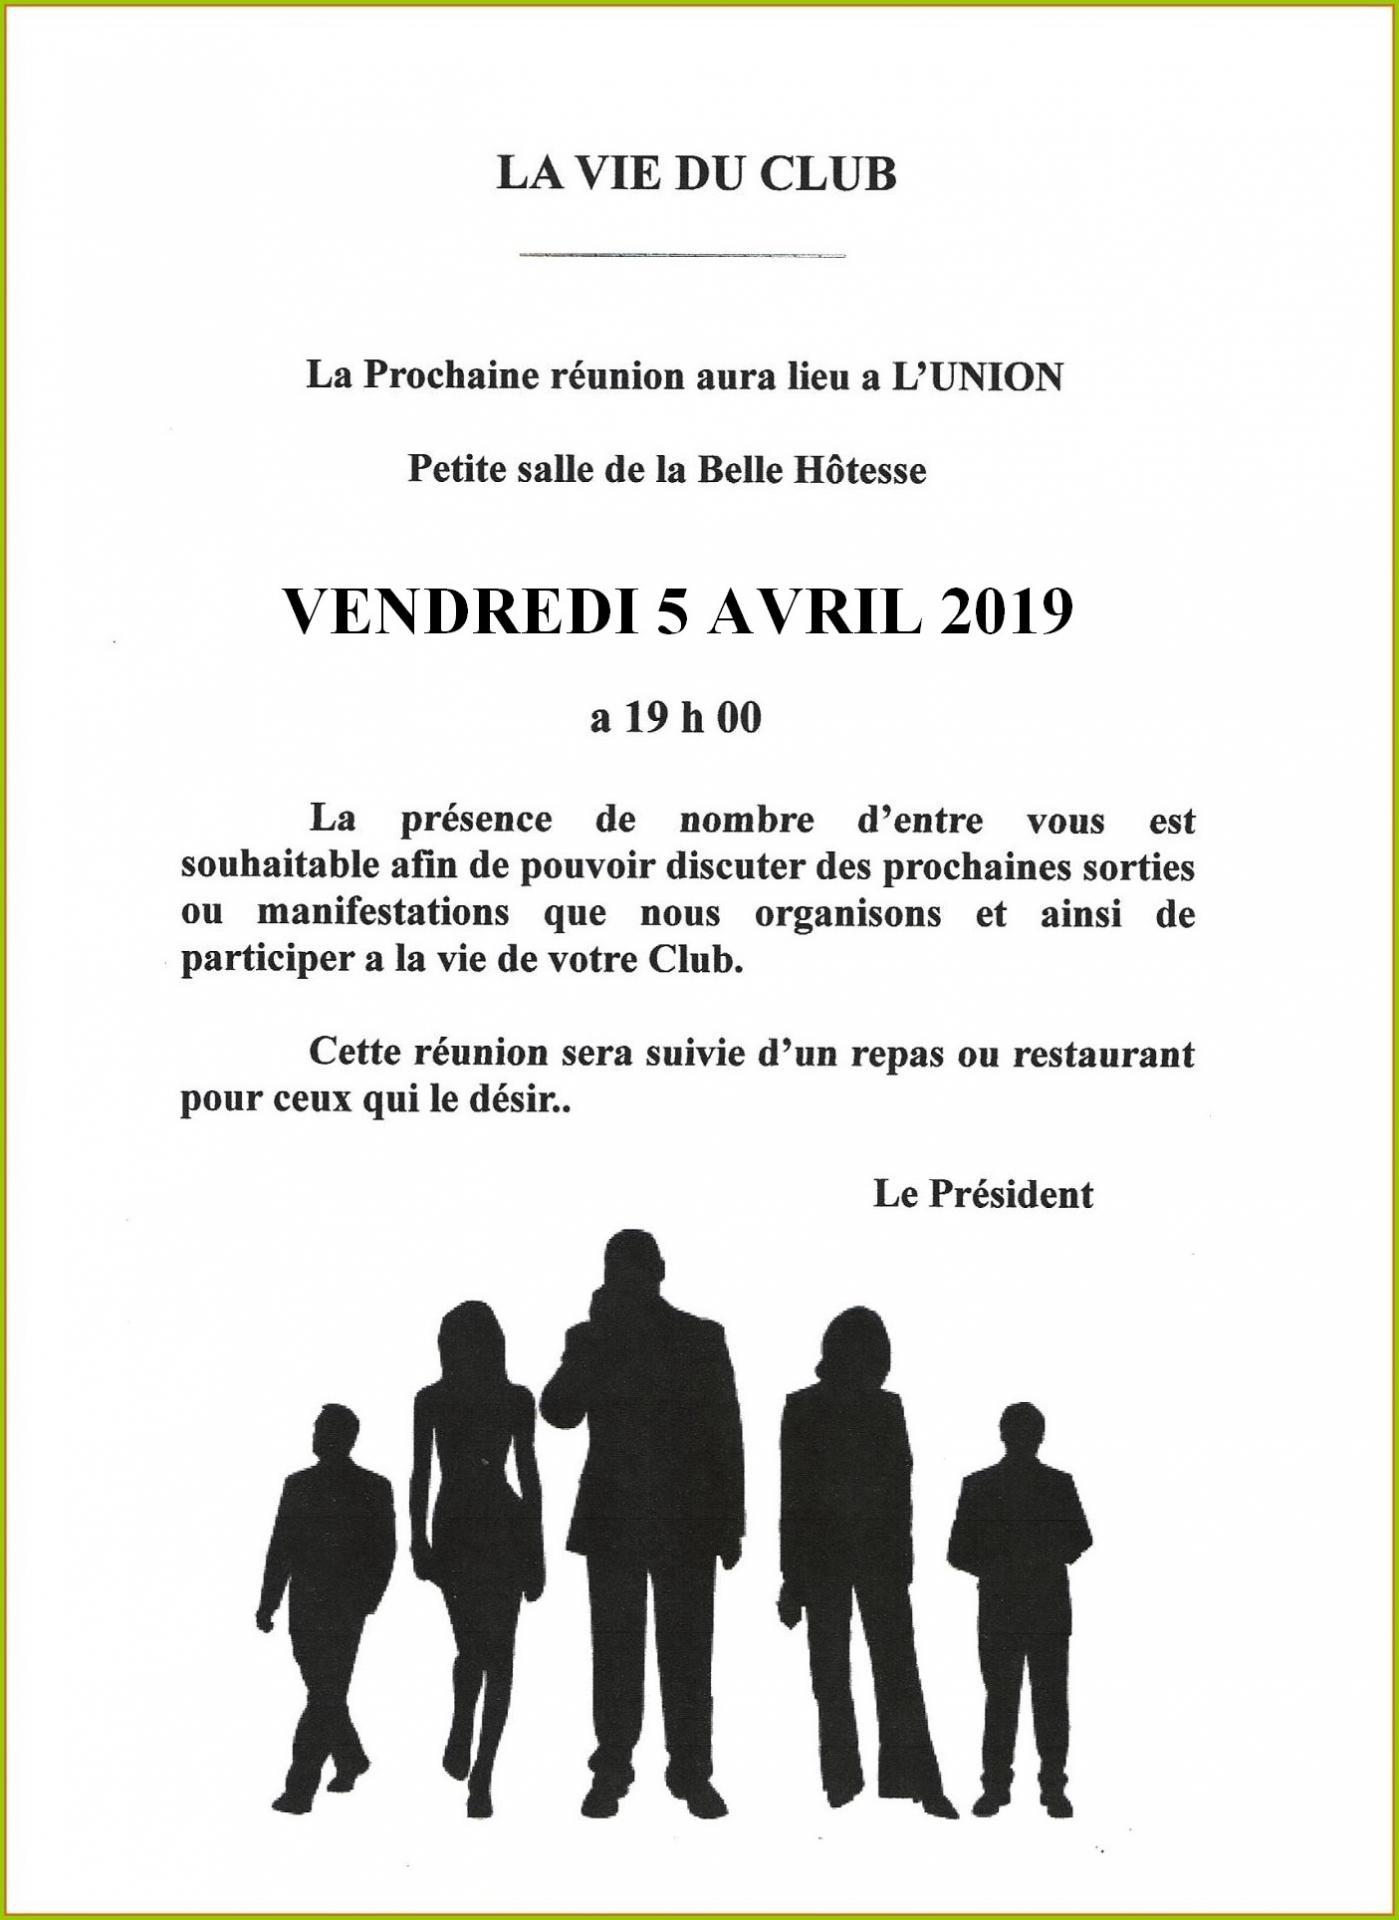 Reunion belle hotesse 04 2019